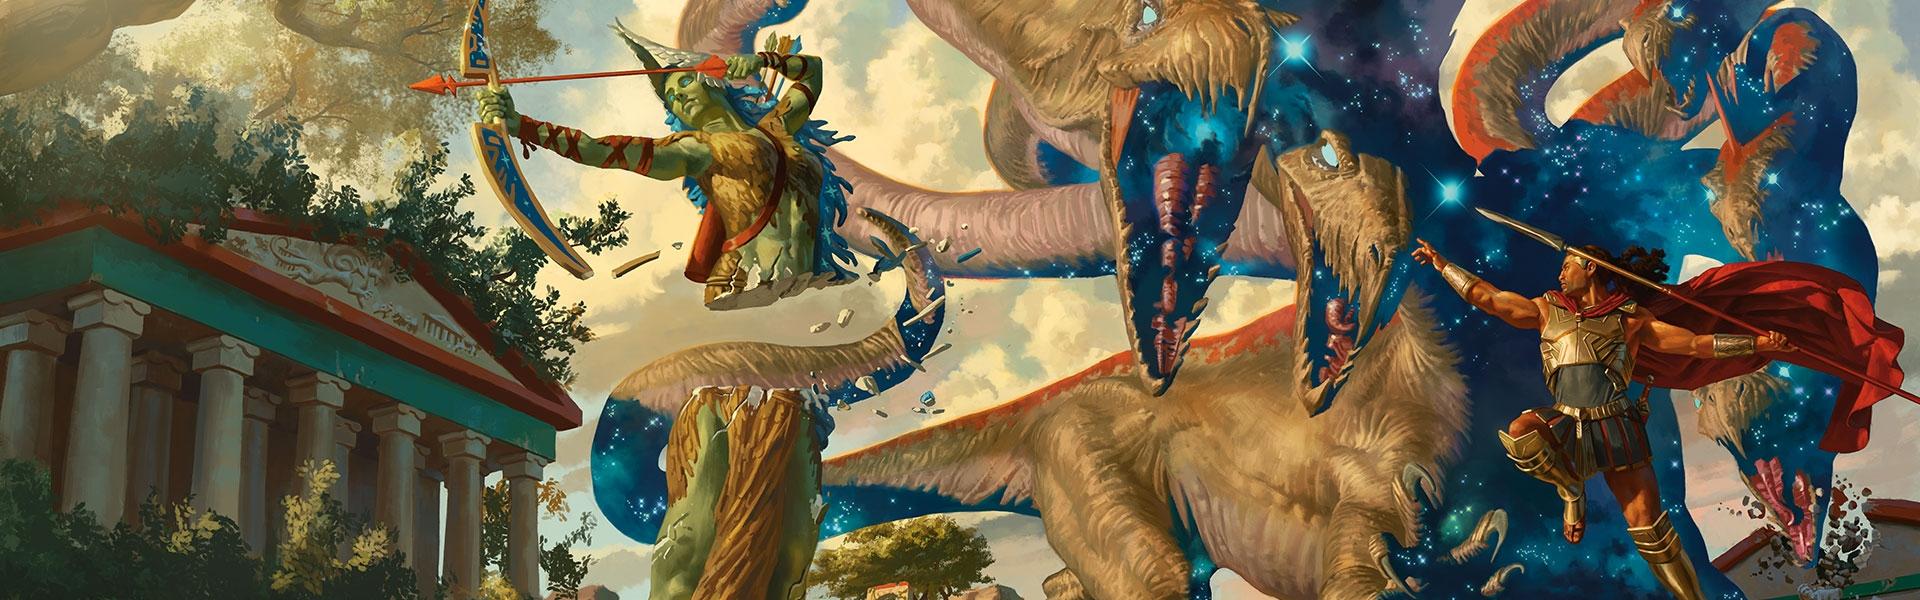 Il Tiro d'Iniziativa: Mythic Odysseys of Theros, gloria o tragedia? thumbnail